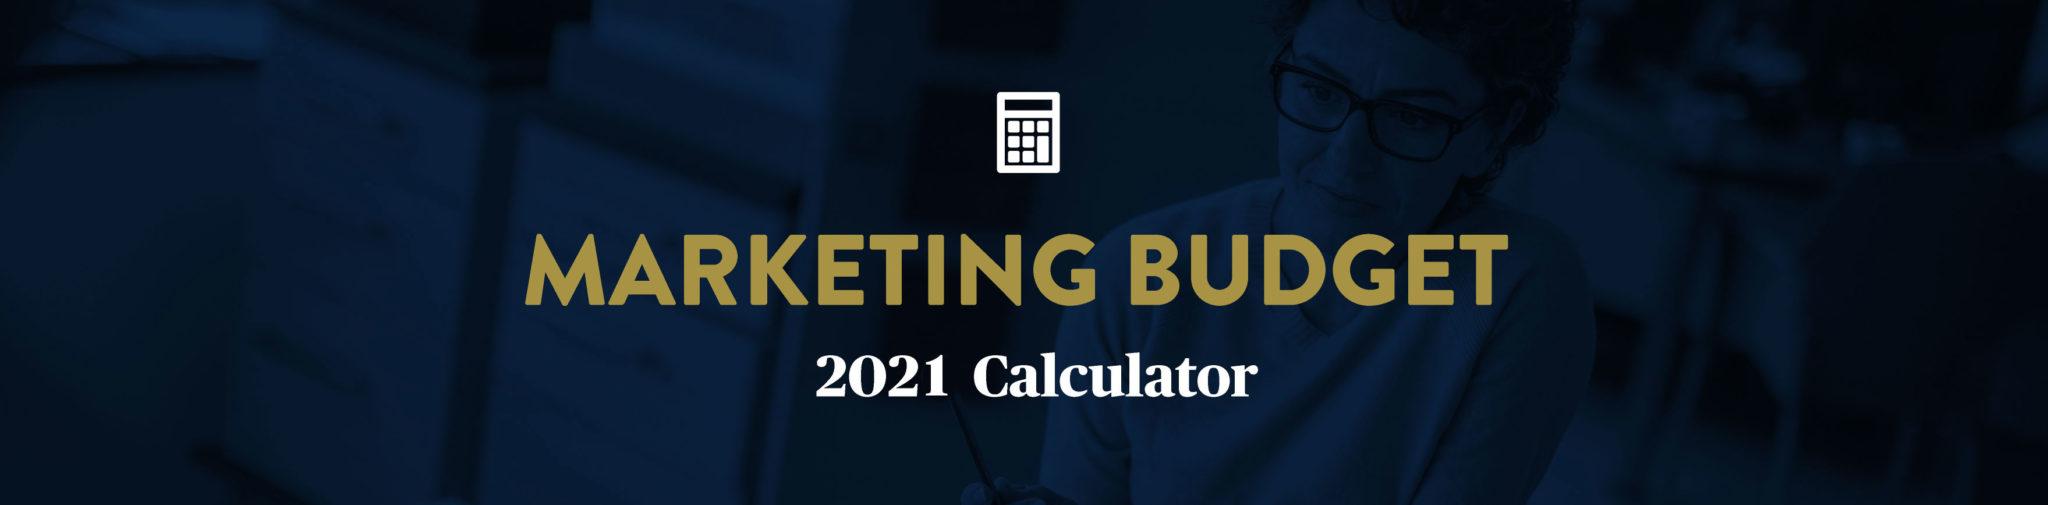 Marketing Budget 2021 Calculator